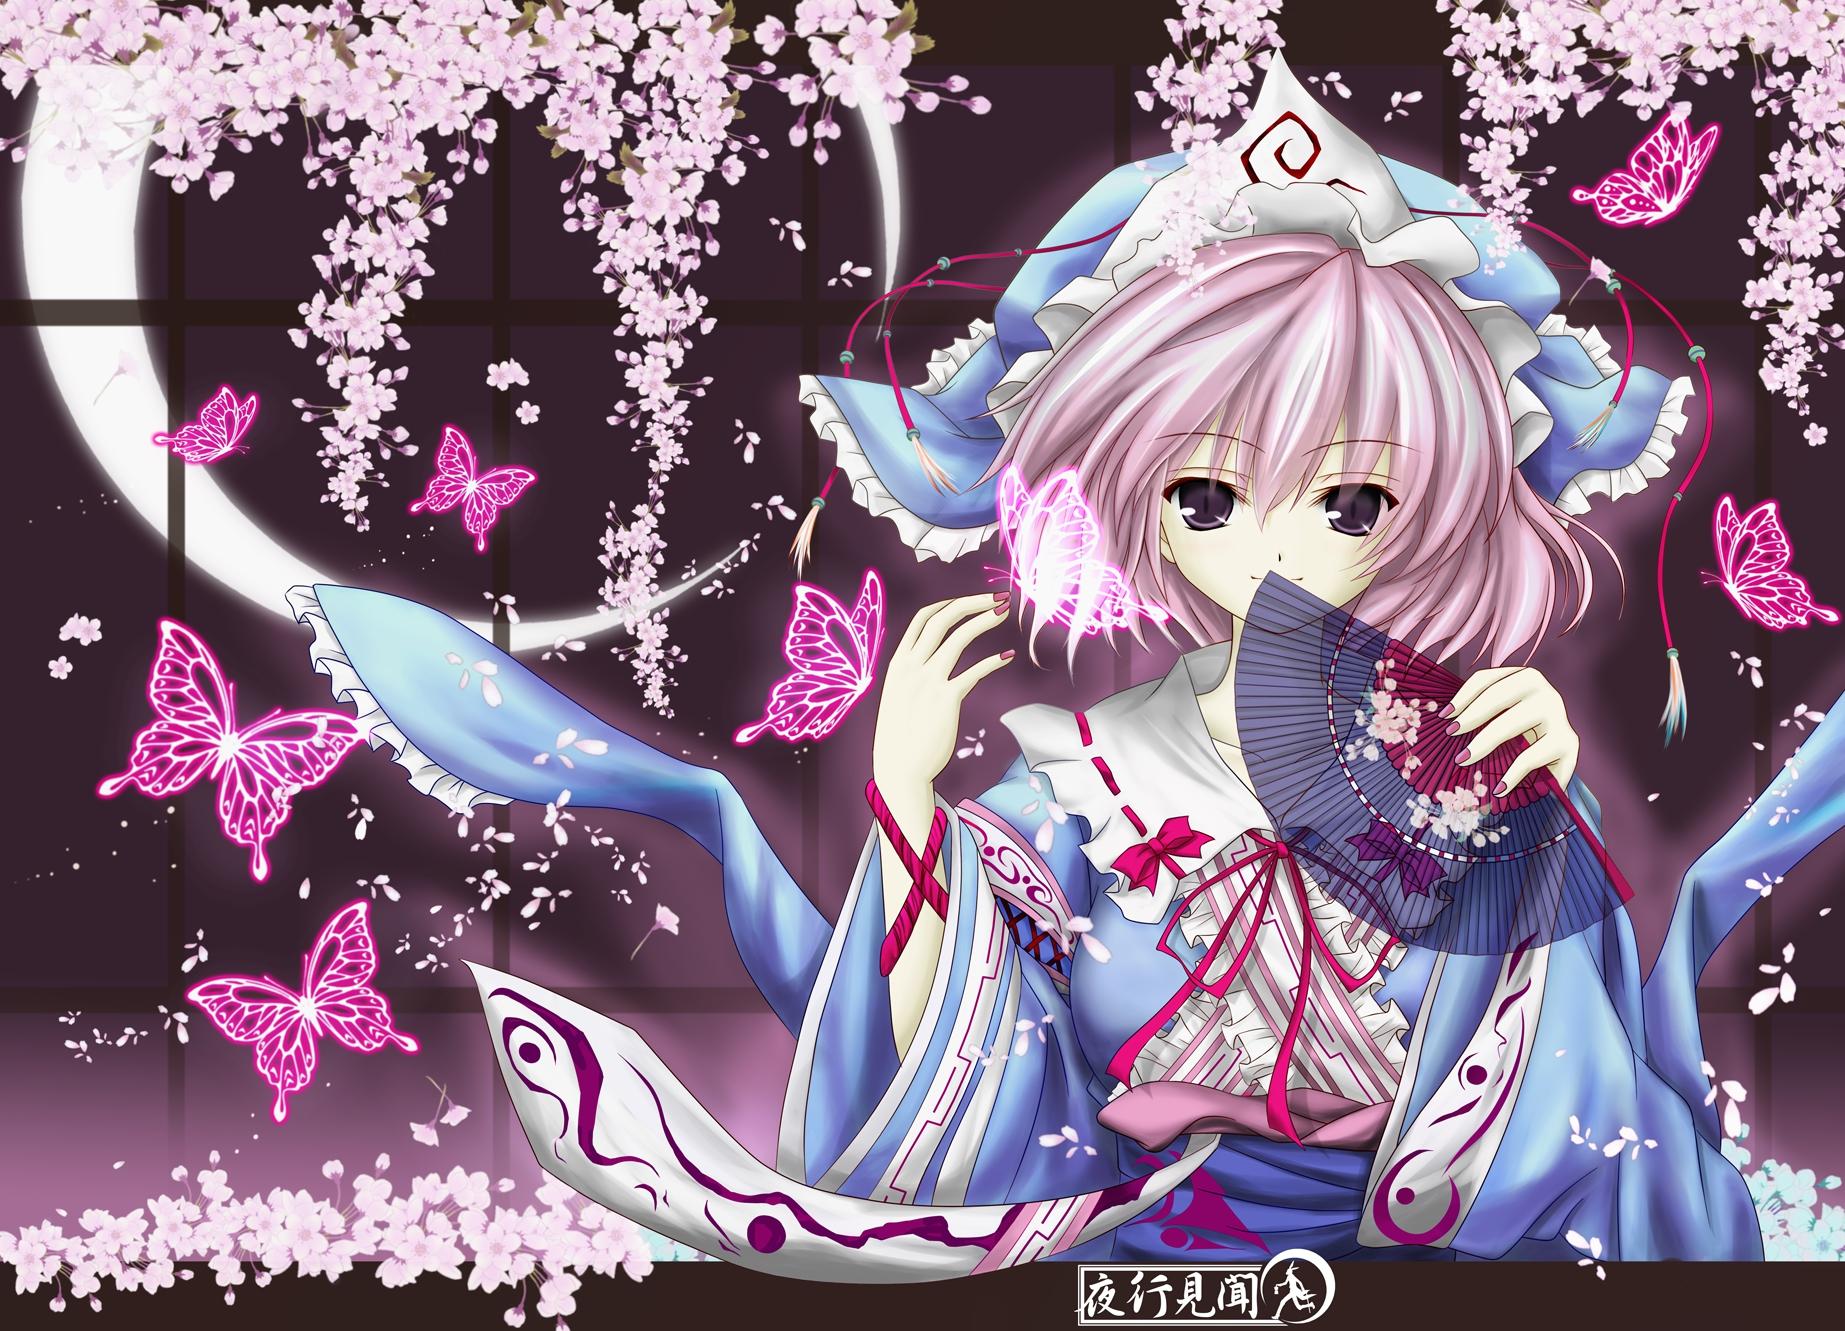 butterfly cherry_blossoms fan flowers hat japanese_clothes kimono moon petals pink_hair purple_eyes ribbons saigyouji_yuyuko short_hair touhou